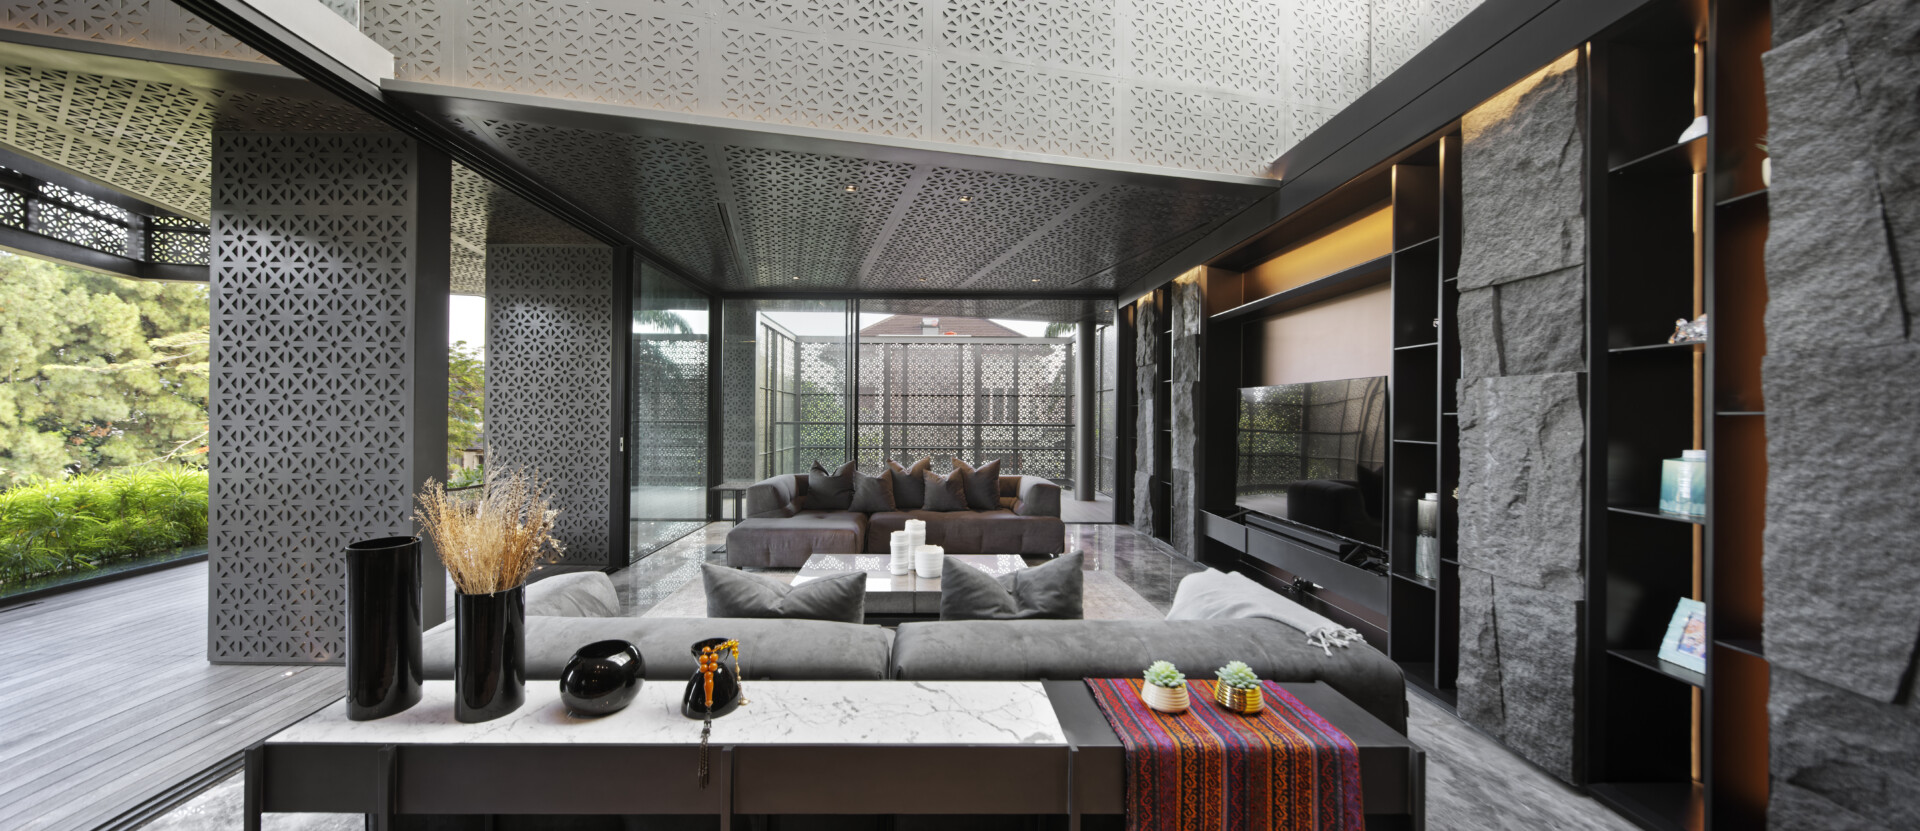 GOLFN HOUSE - Image 12